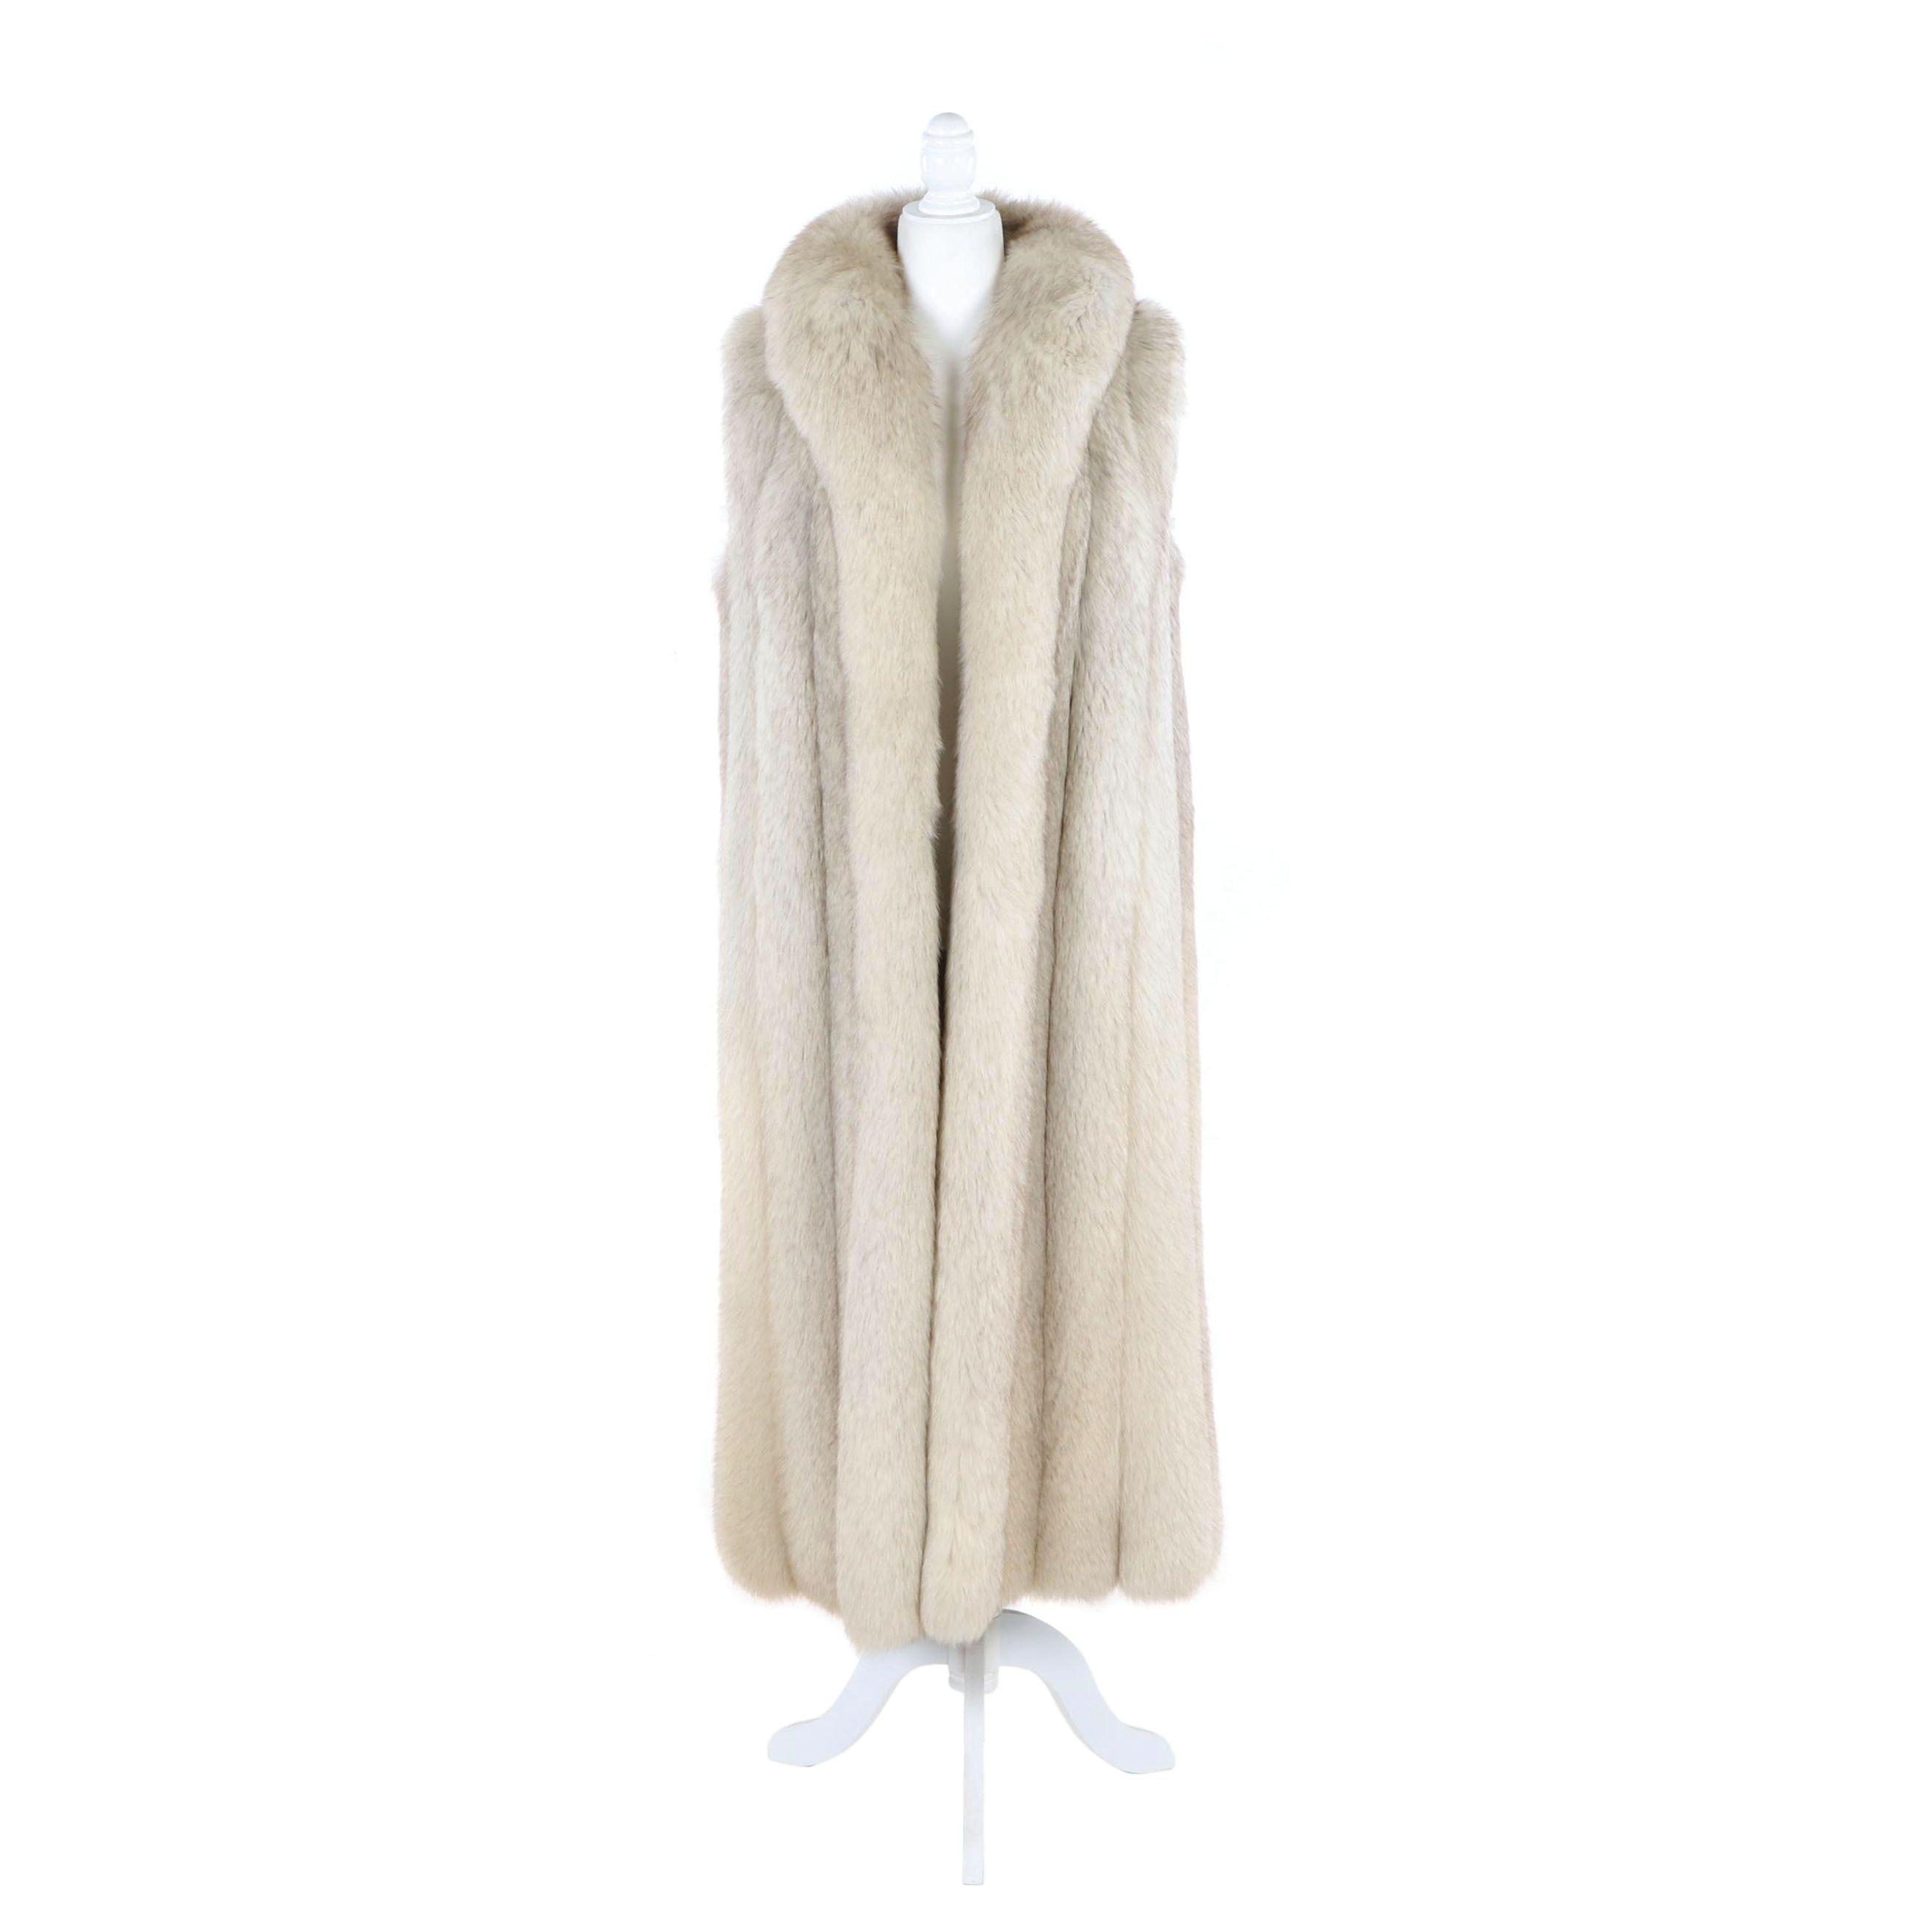 Women's Blue Fox Fur Longline Vest with Tuxedo Collar from William H. Harris